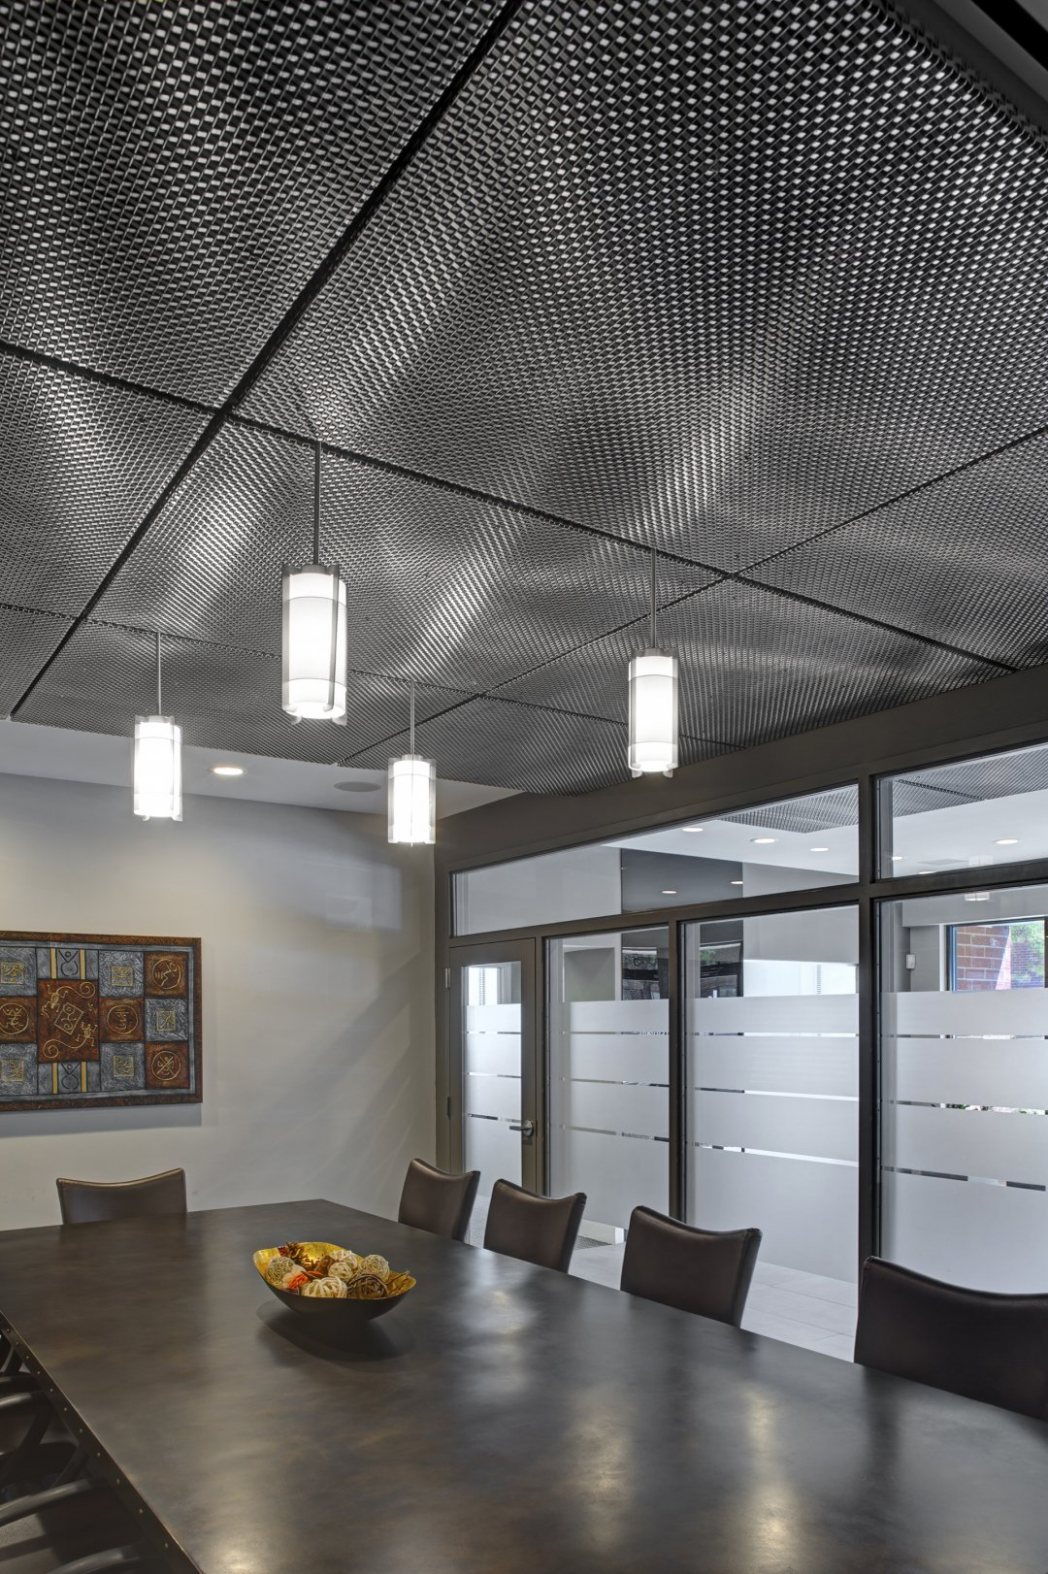 84 Metal Mesh Ceiling Tiles